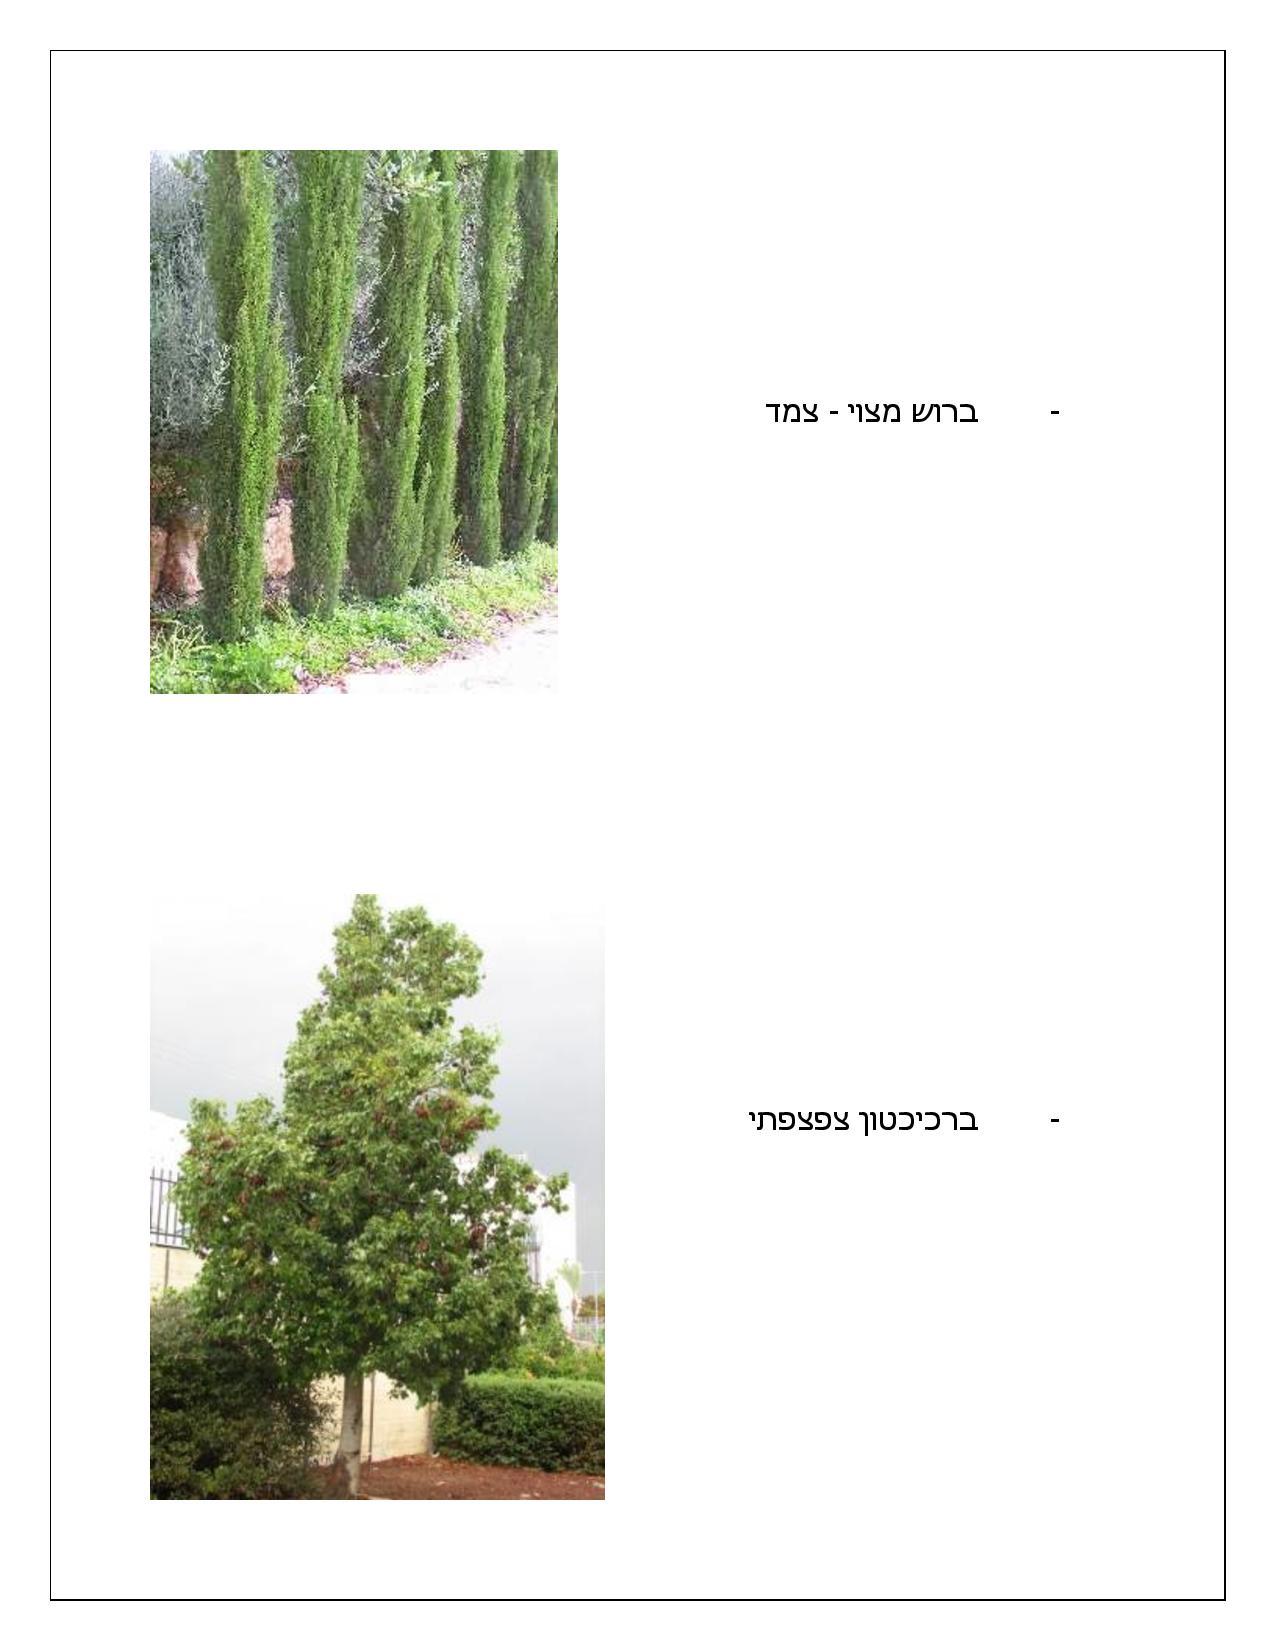 Document page 008 - דוגמא להצעת מחיר עבור עיצוב גינה